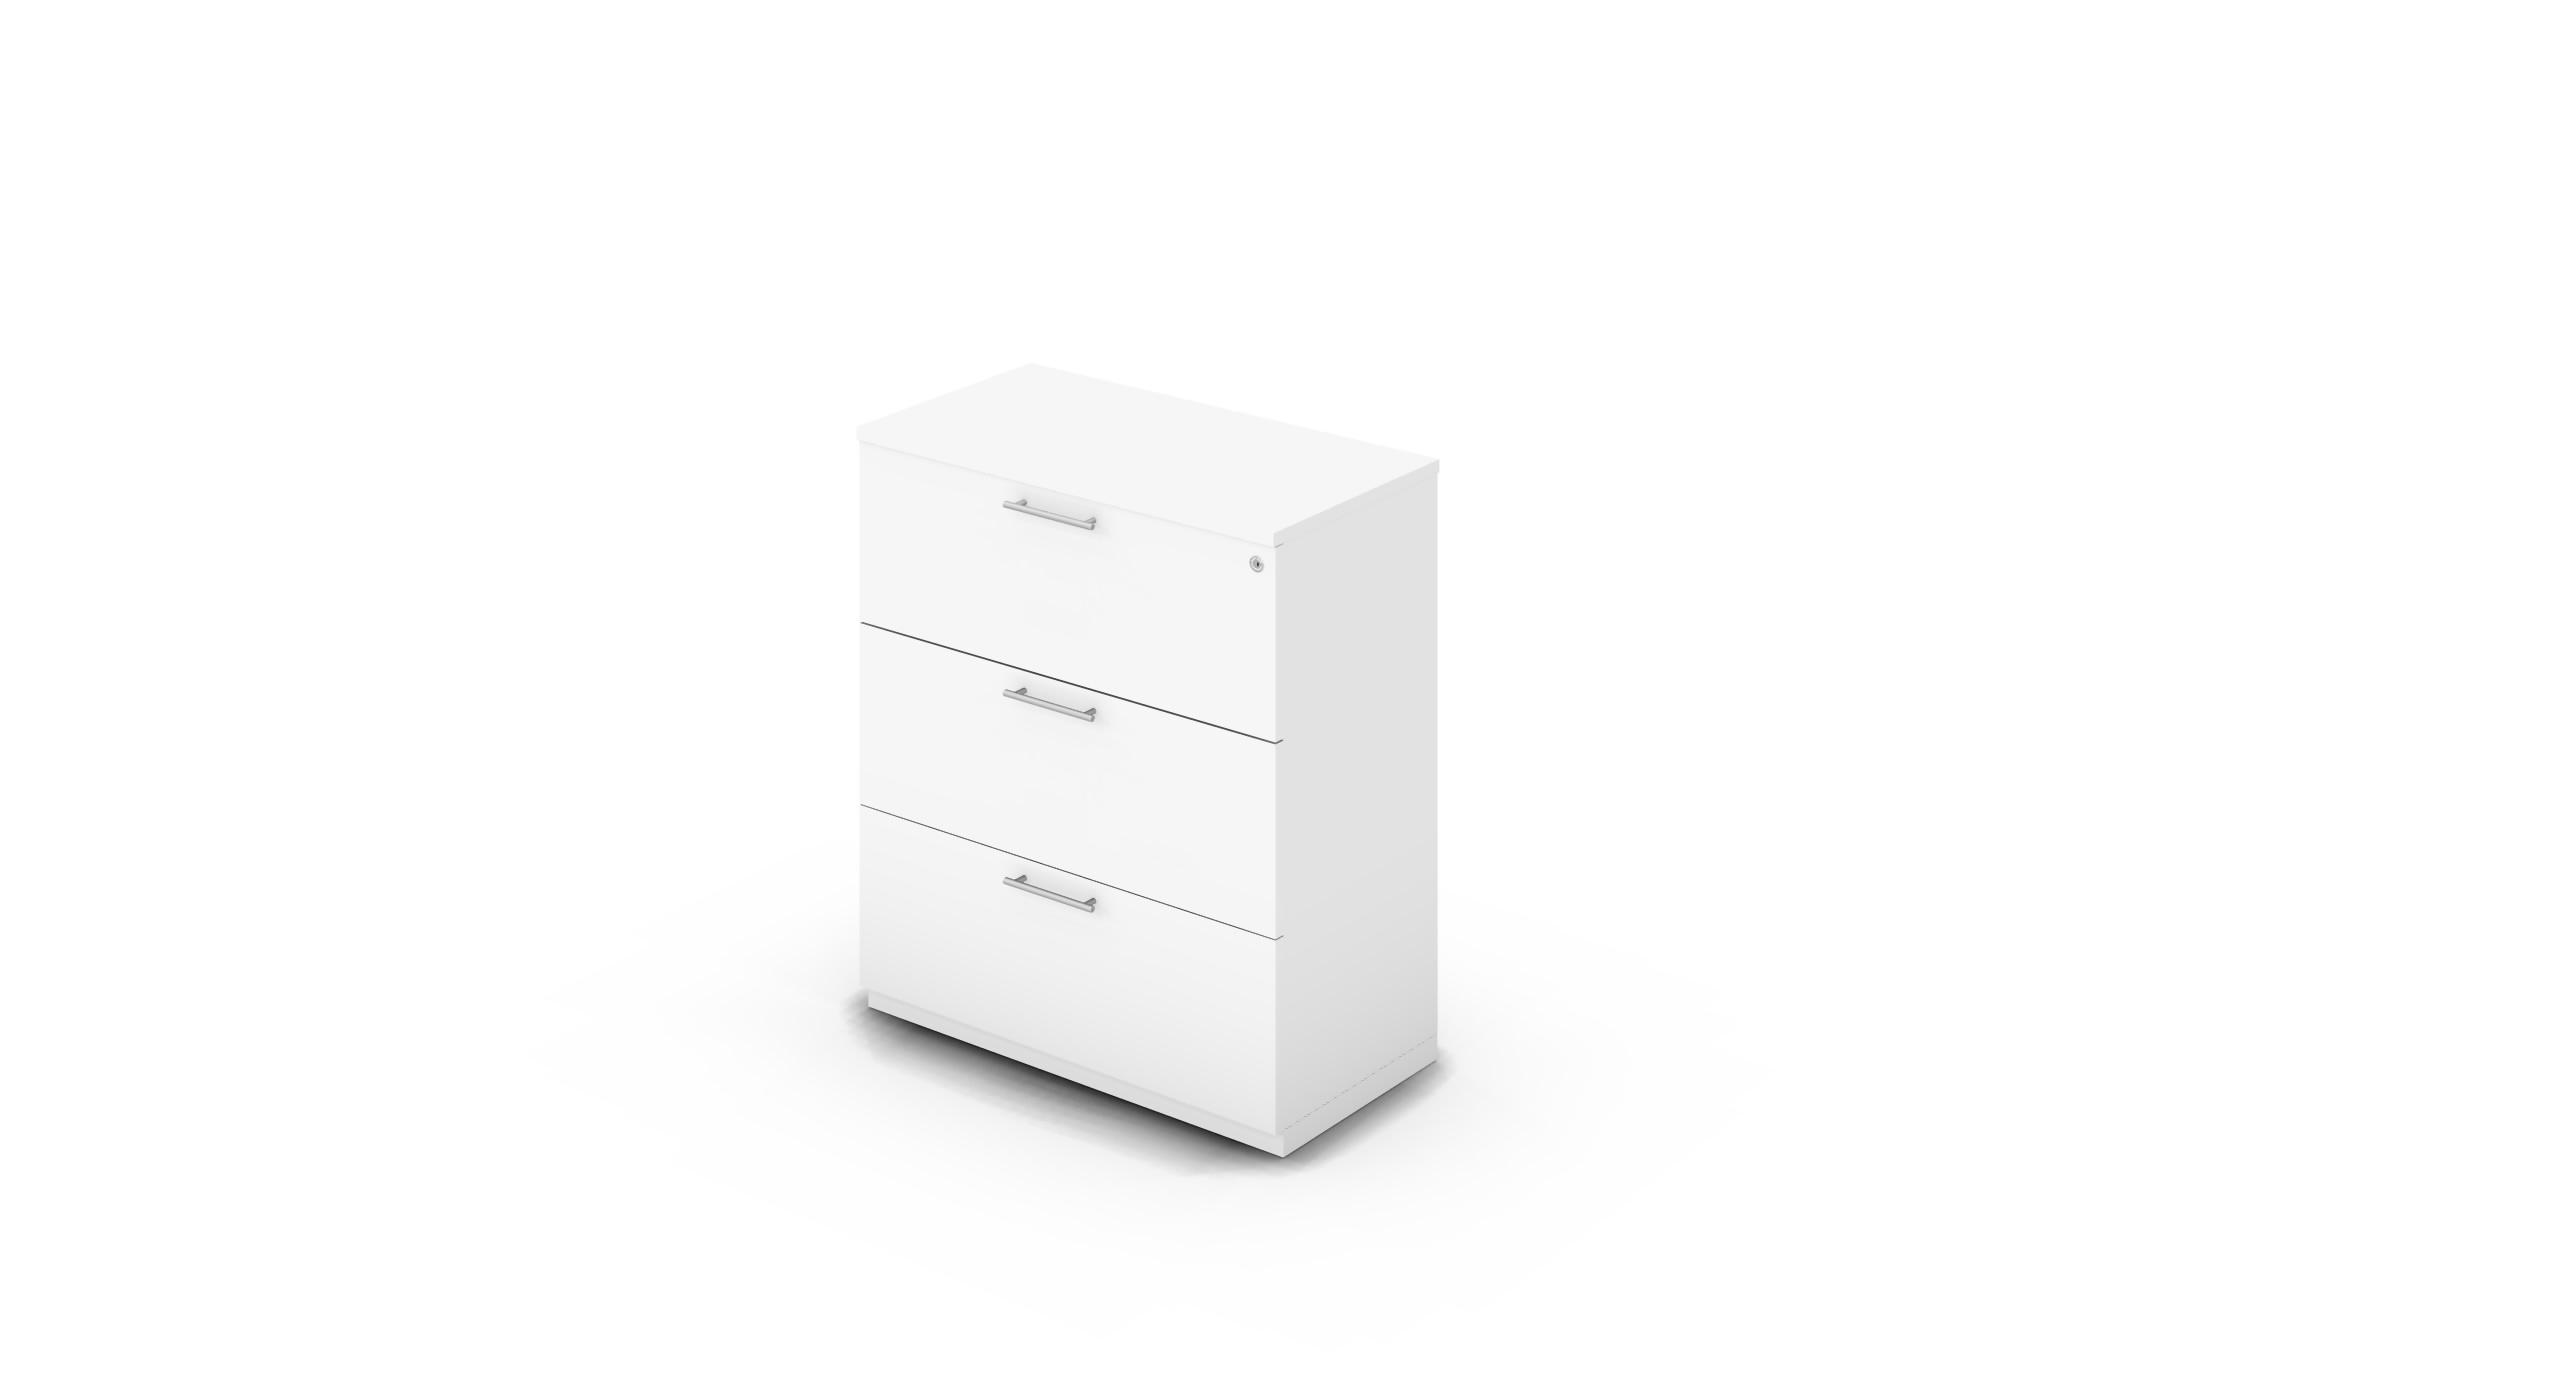 Cabinet_900x450x1125_DR_White_Bar_Round_WithCylinder